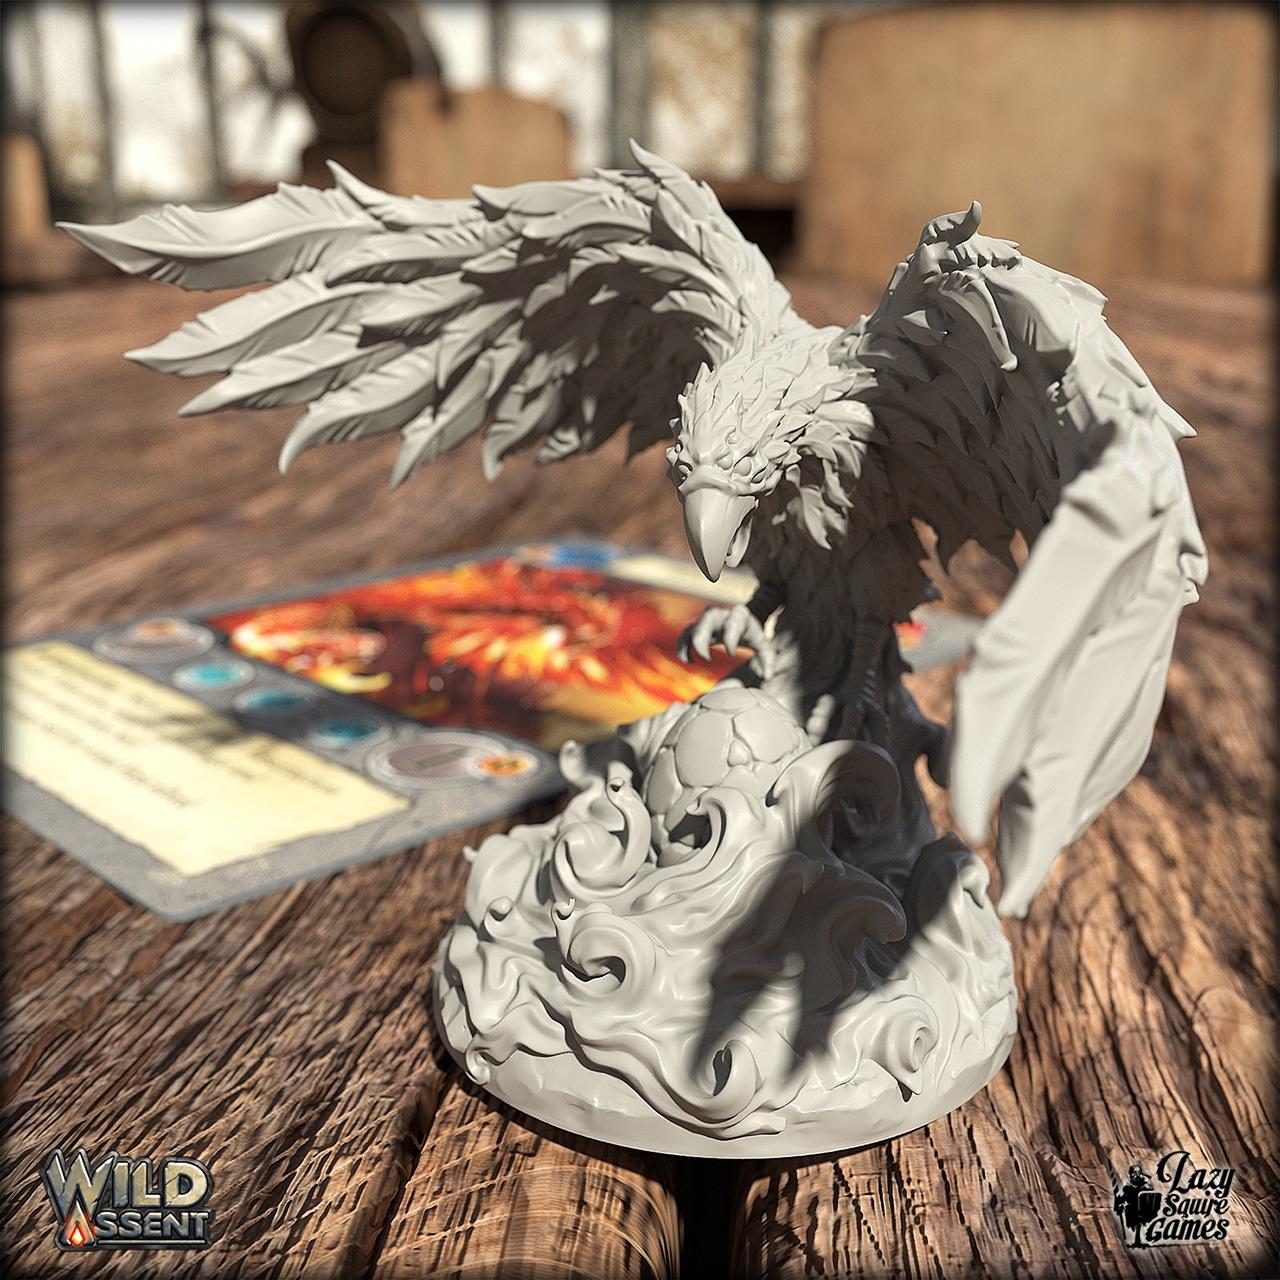 wild assent gra planszowa z kickstartera 2